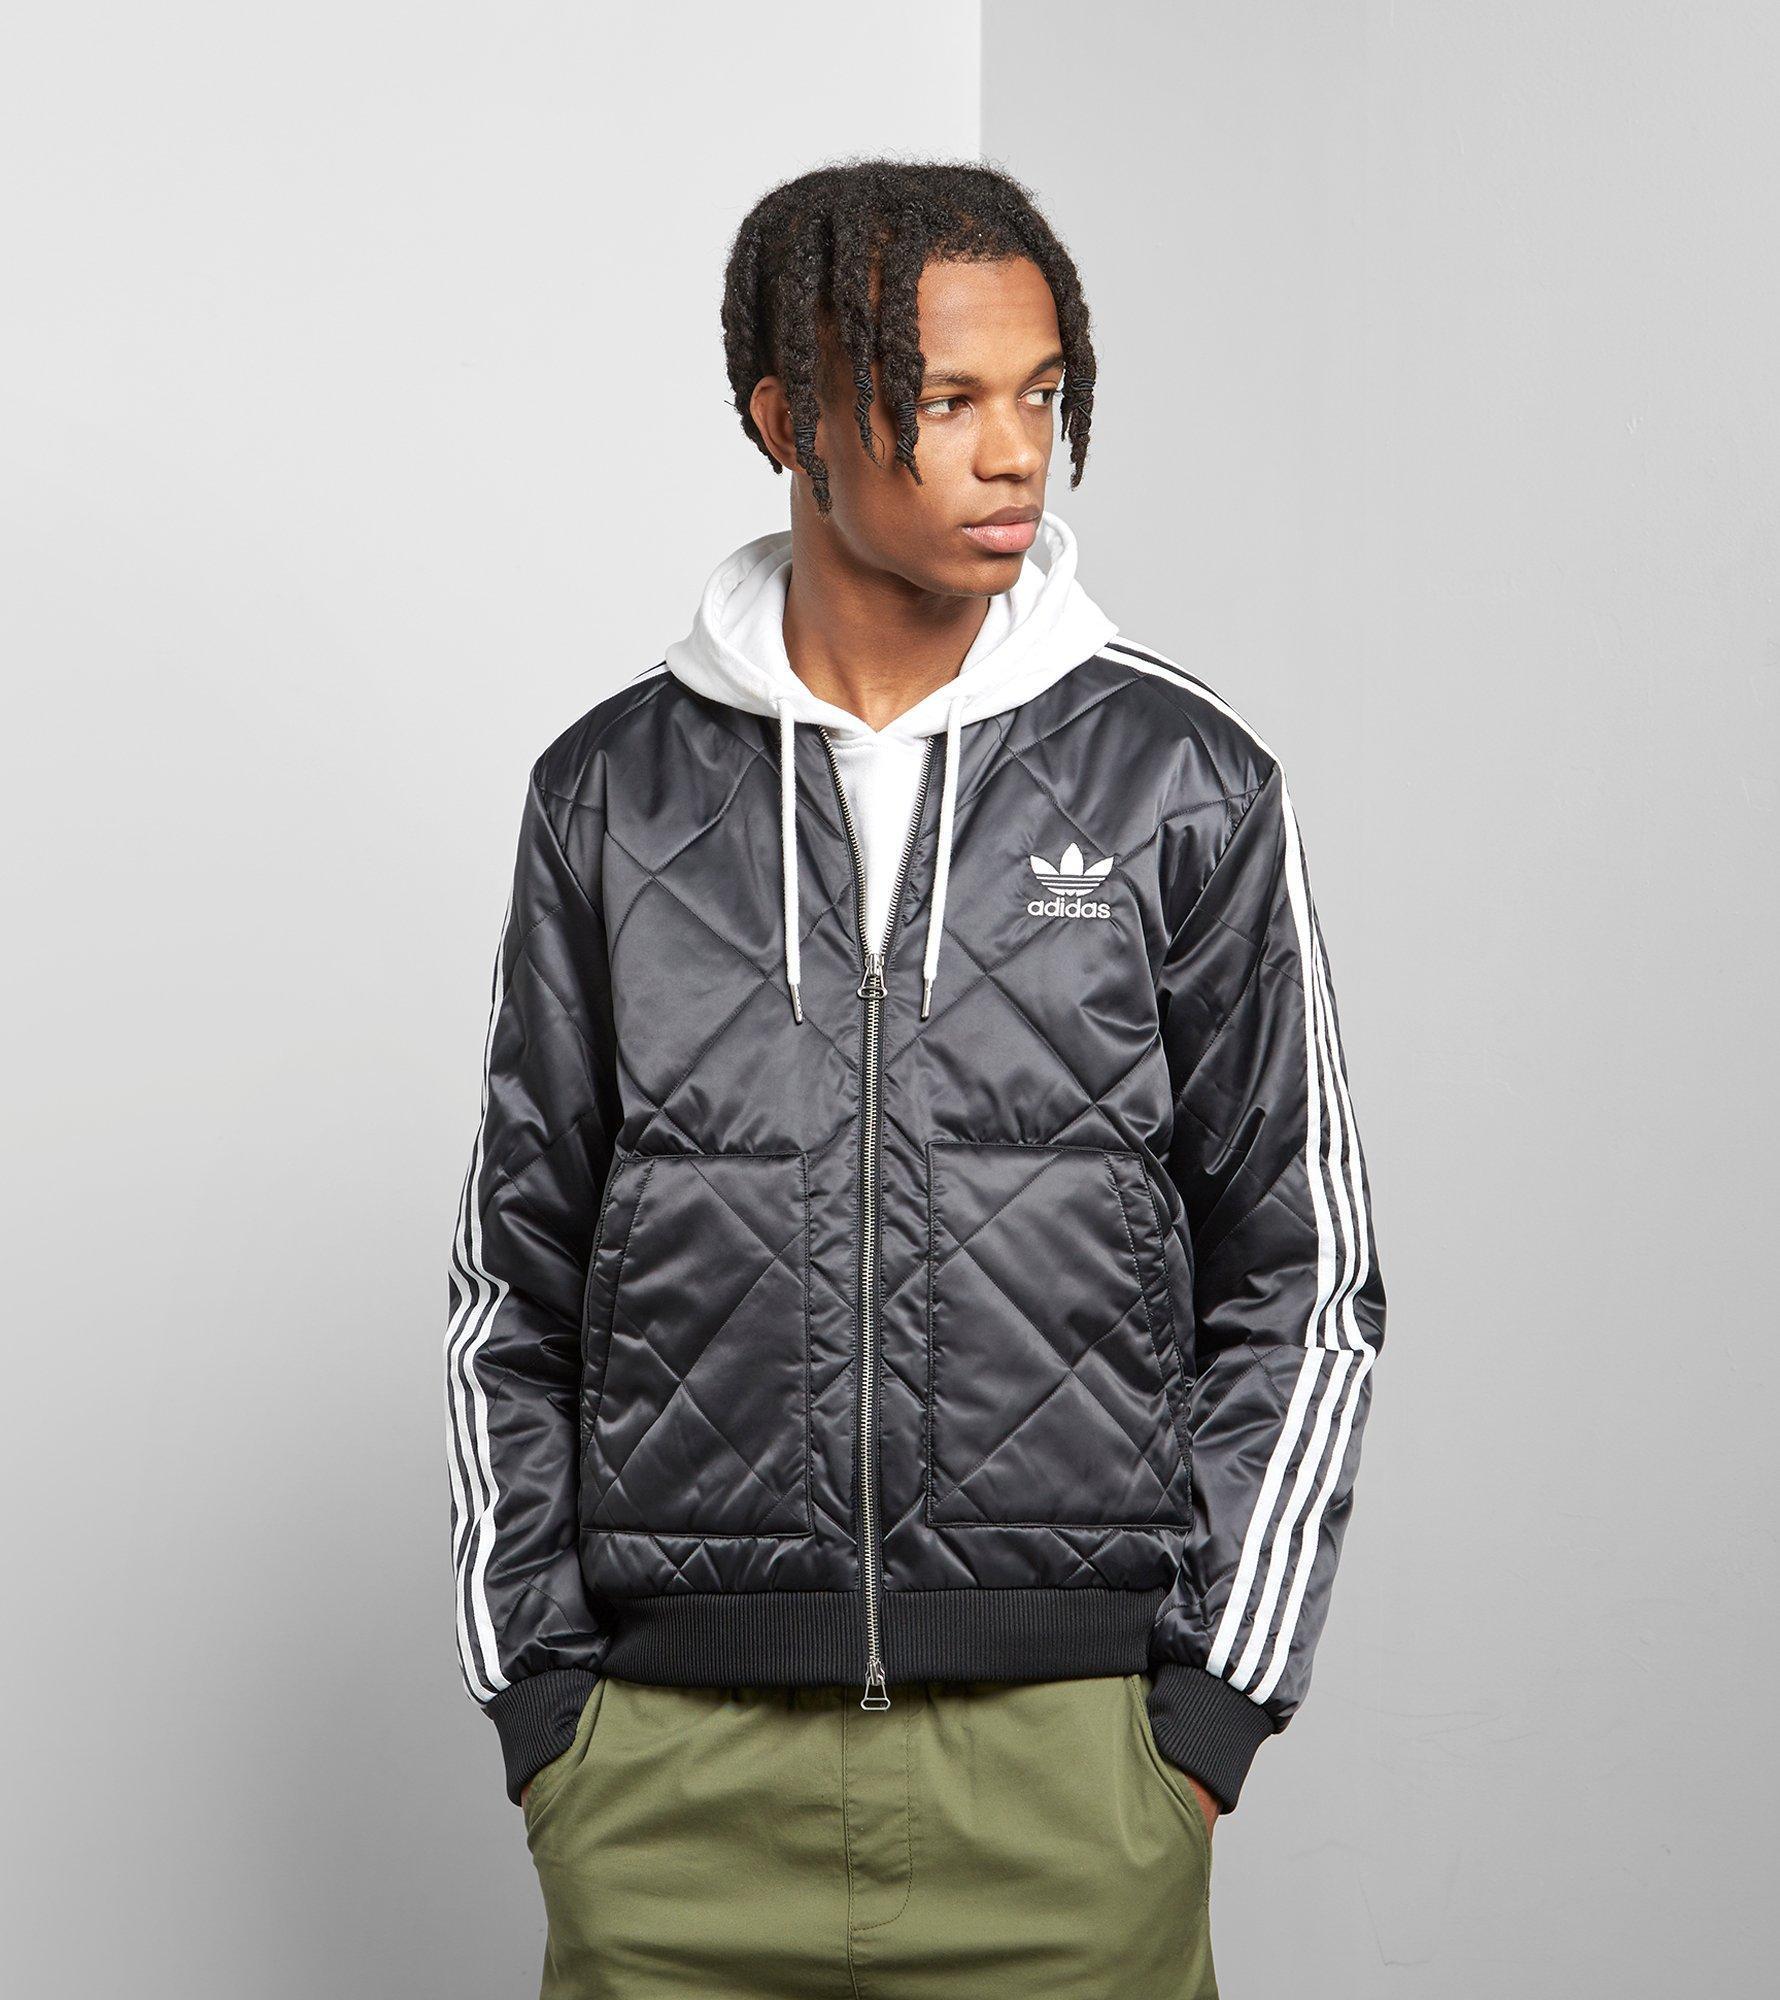 b9f972425 Lyst - adidas Originals Sst Quilted Jacket in Black for Men